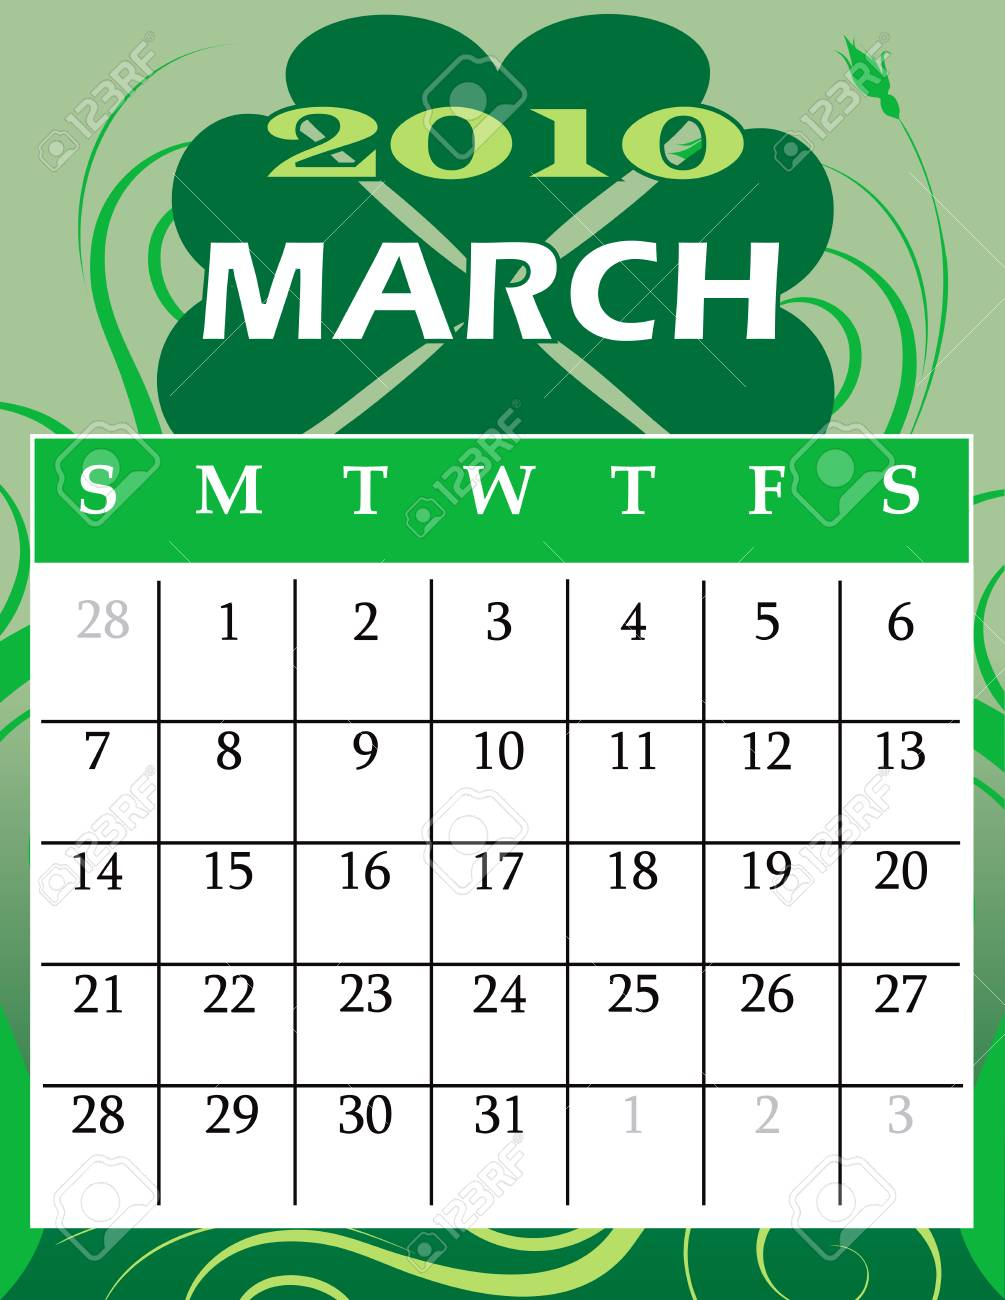 Illustration of 2010 Calendar Stock Vector - 5716596